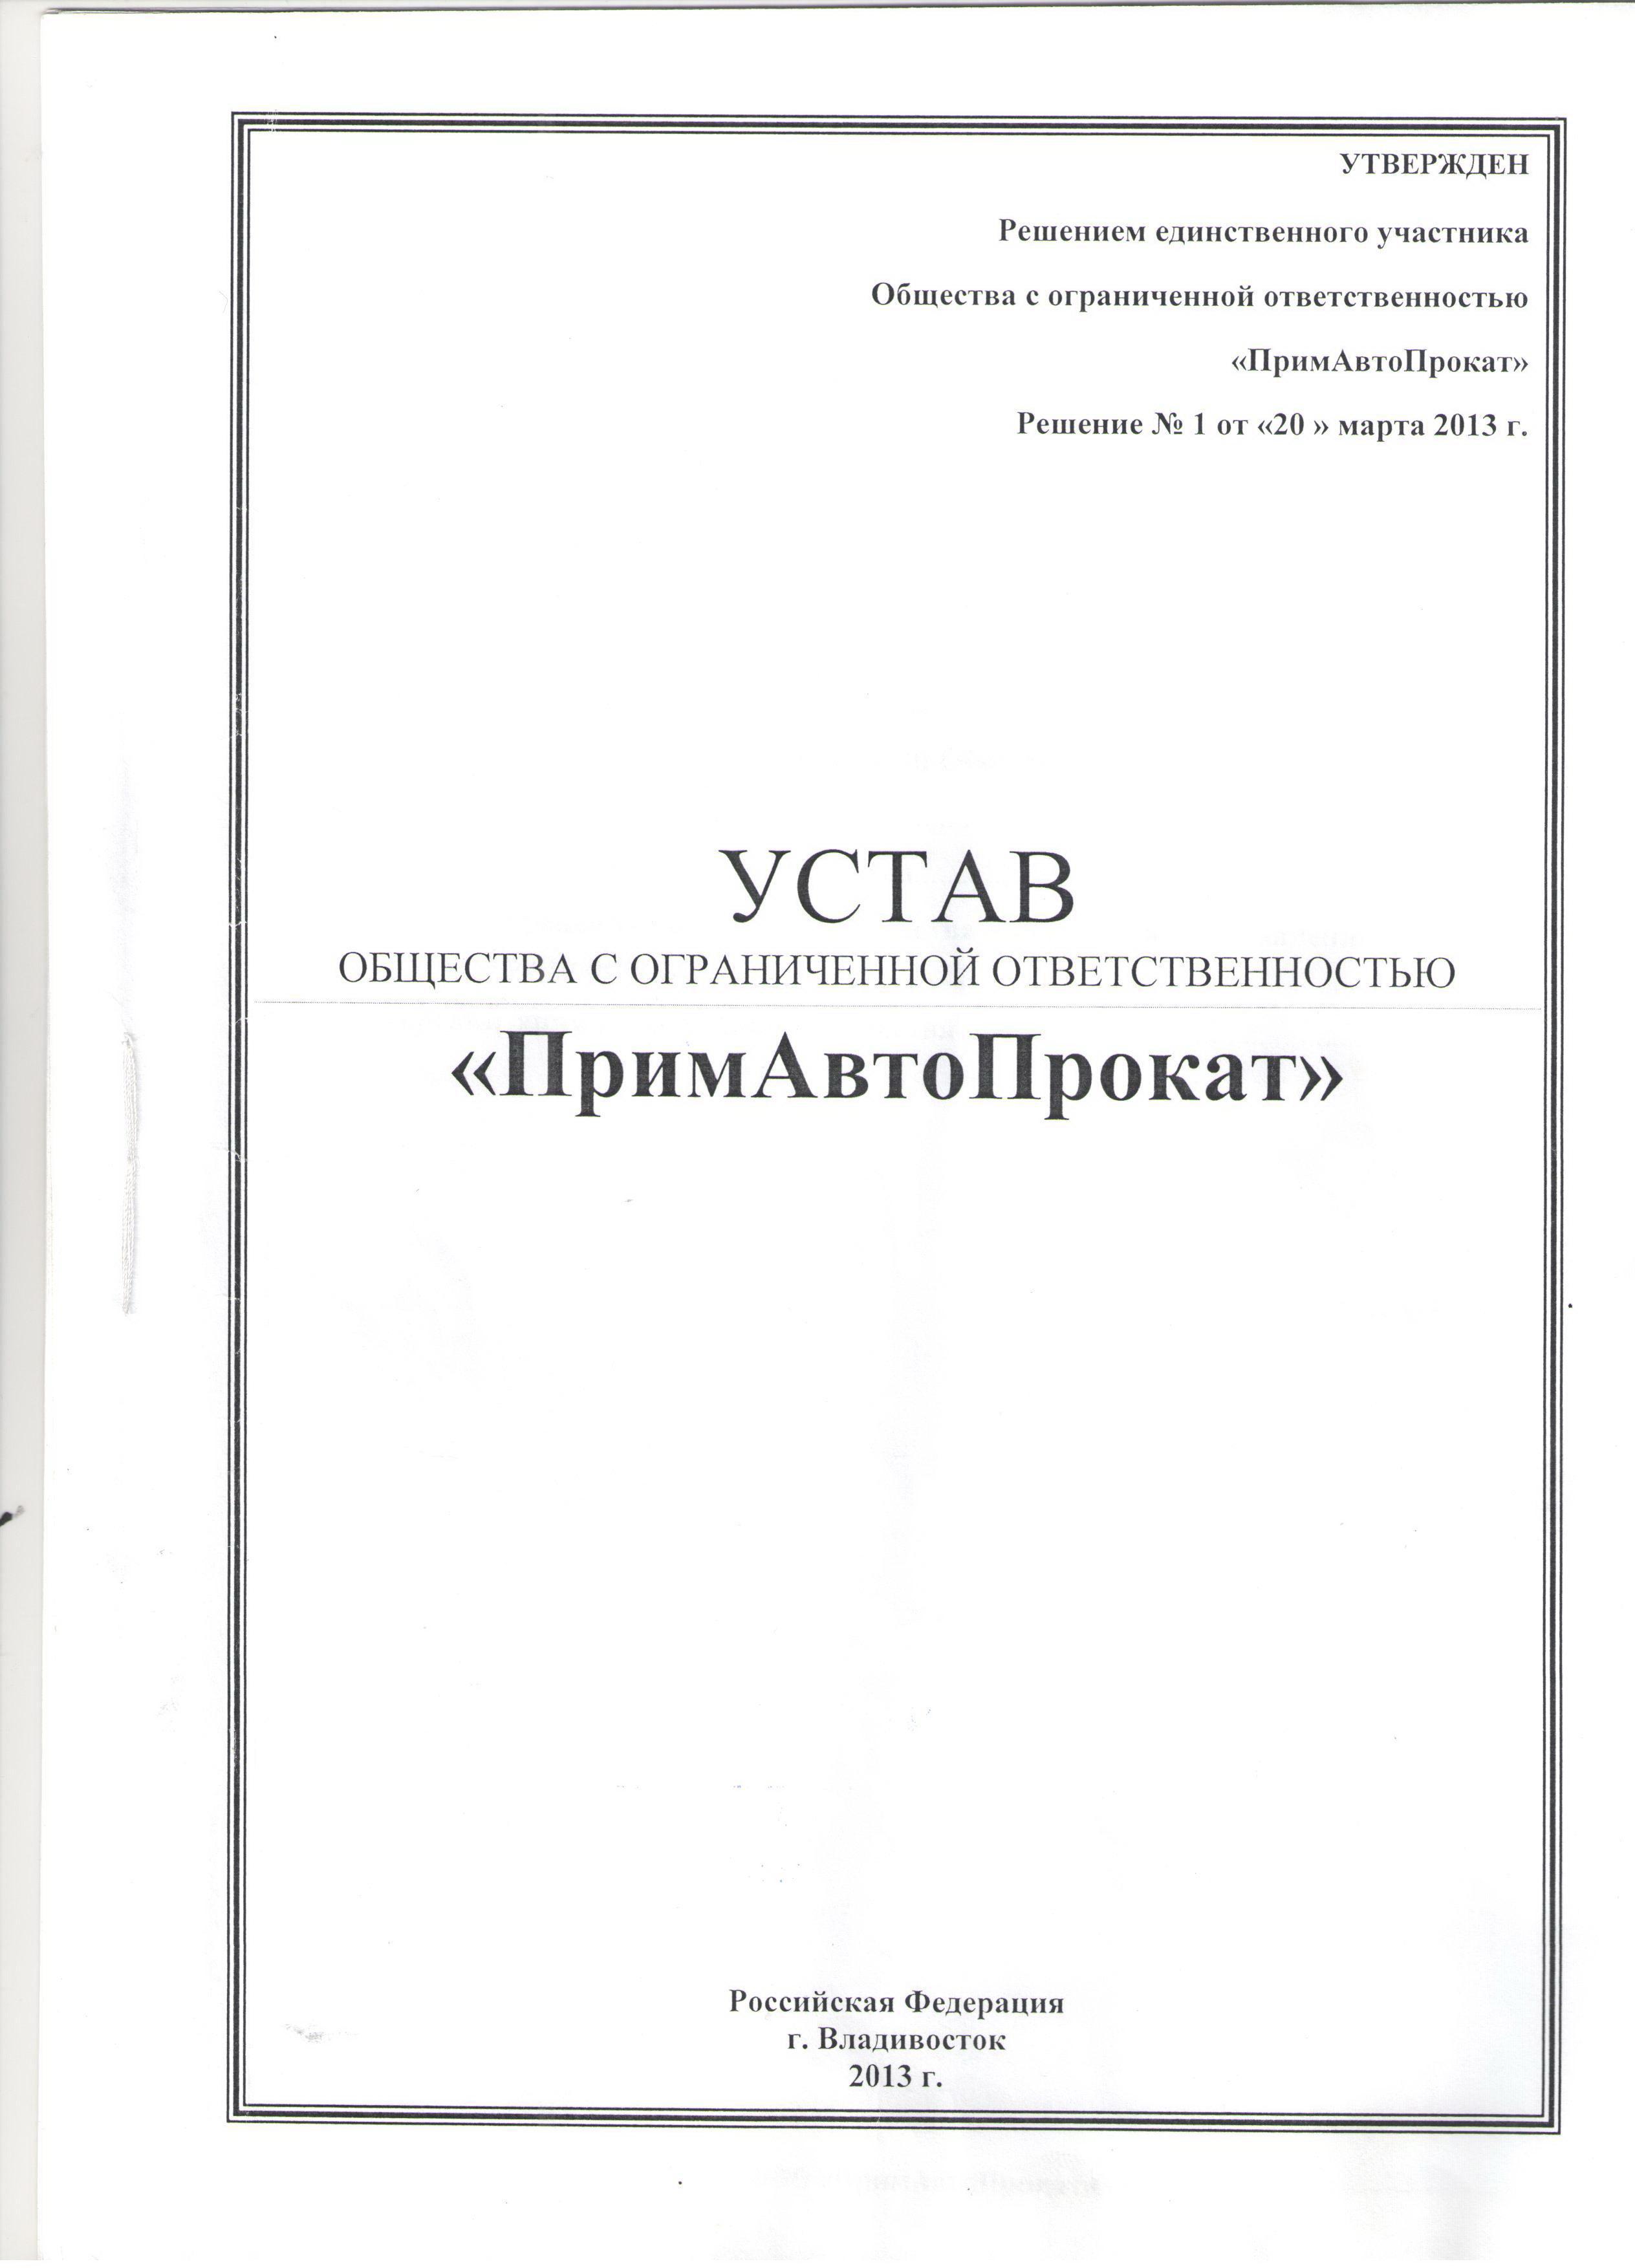 Устав ООО ПримАвтоПрокат